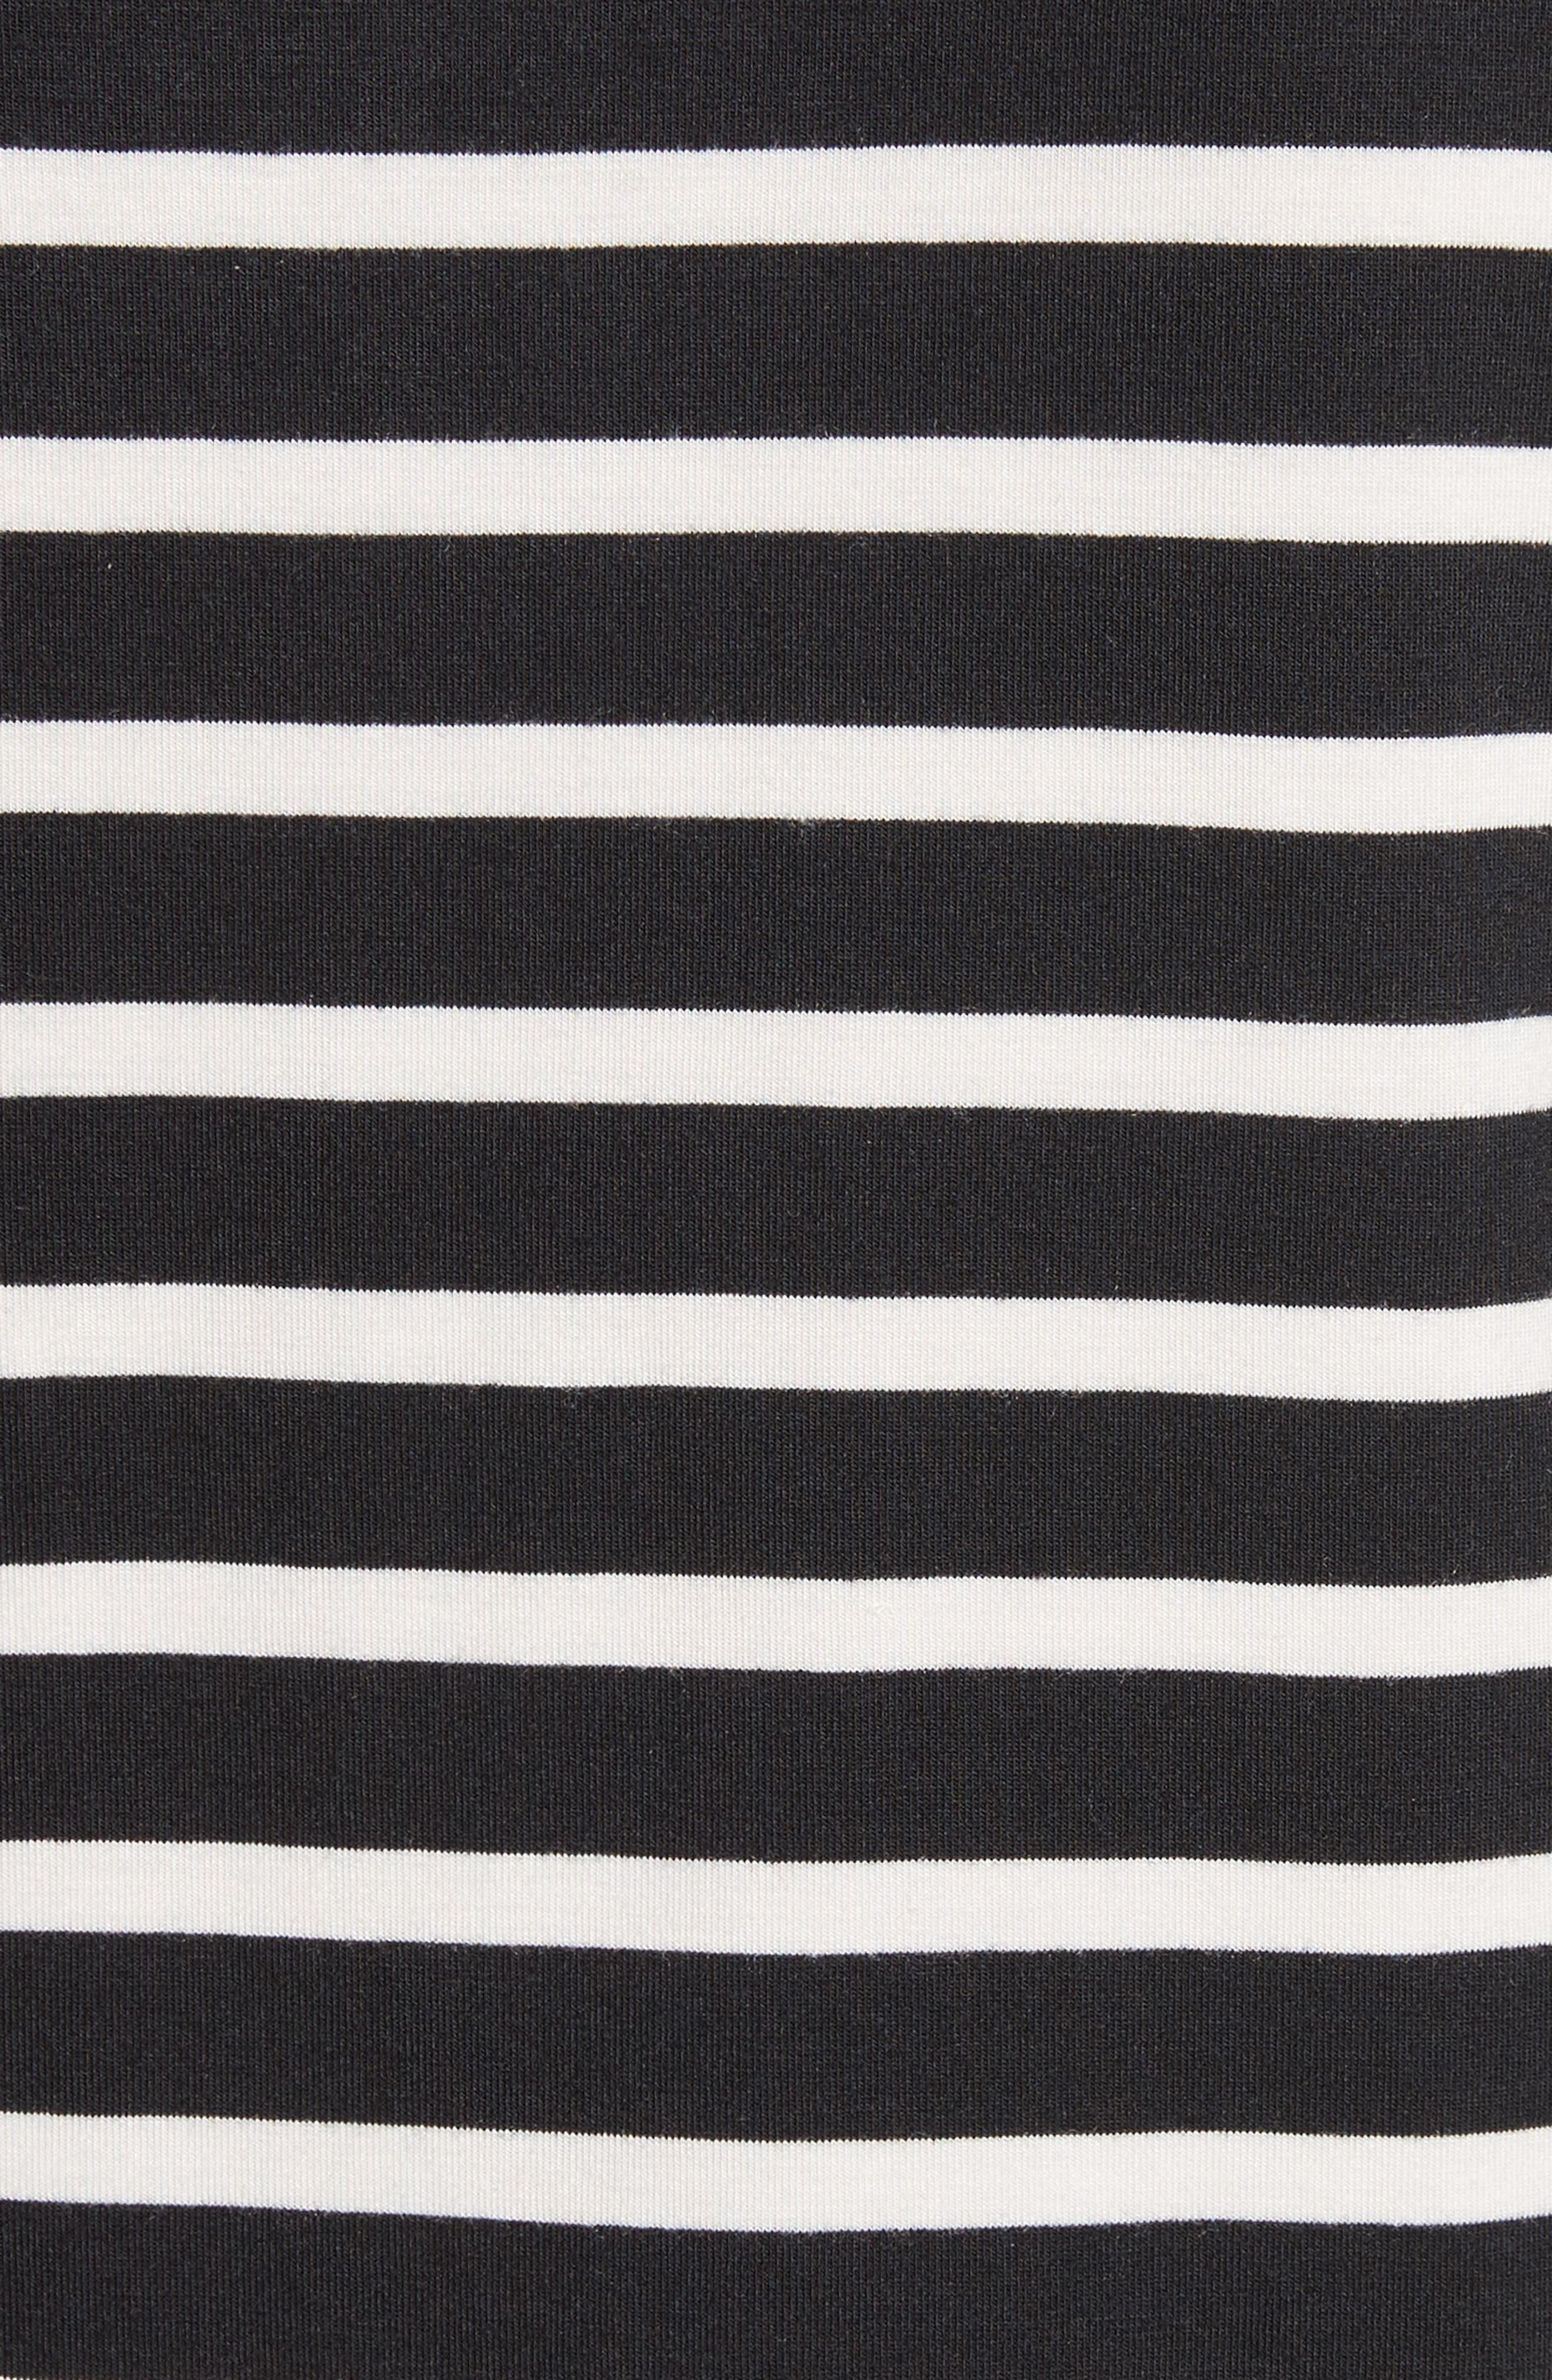 kate spade lace flounce stripe top,                             Alternate thumbnail 5, color,                             Black/ Off-White